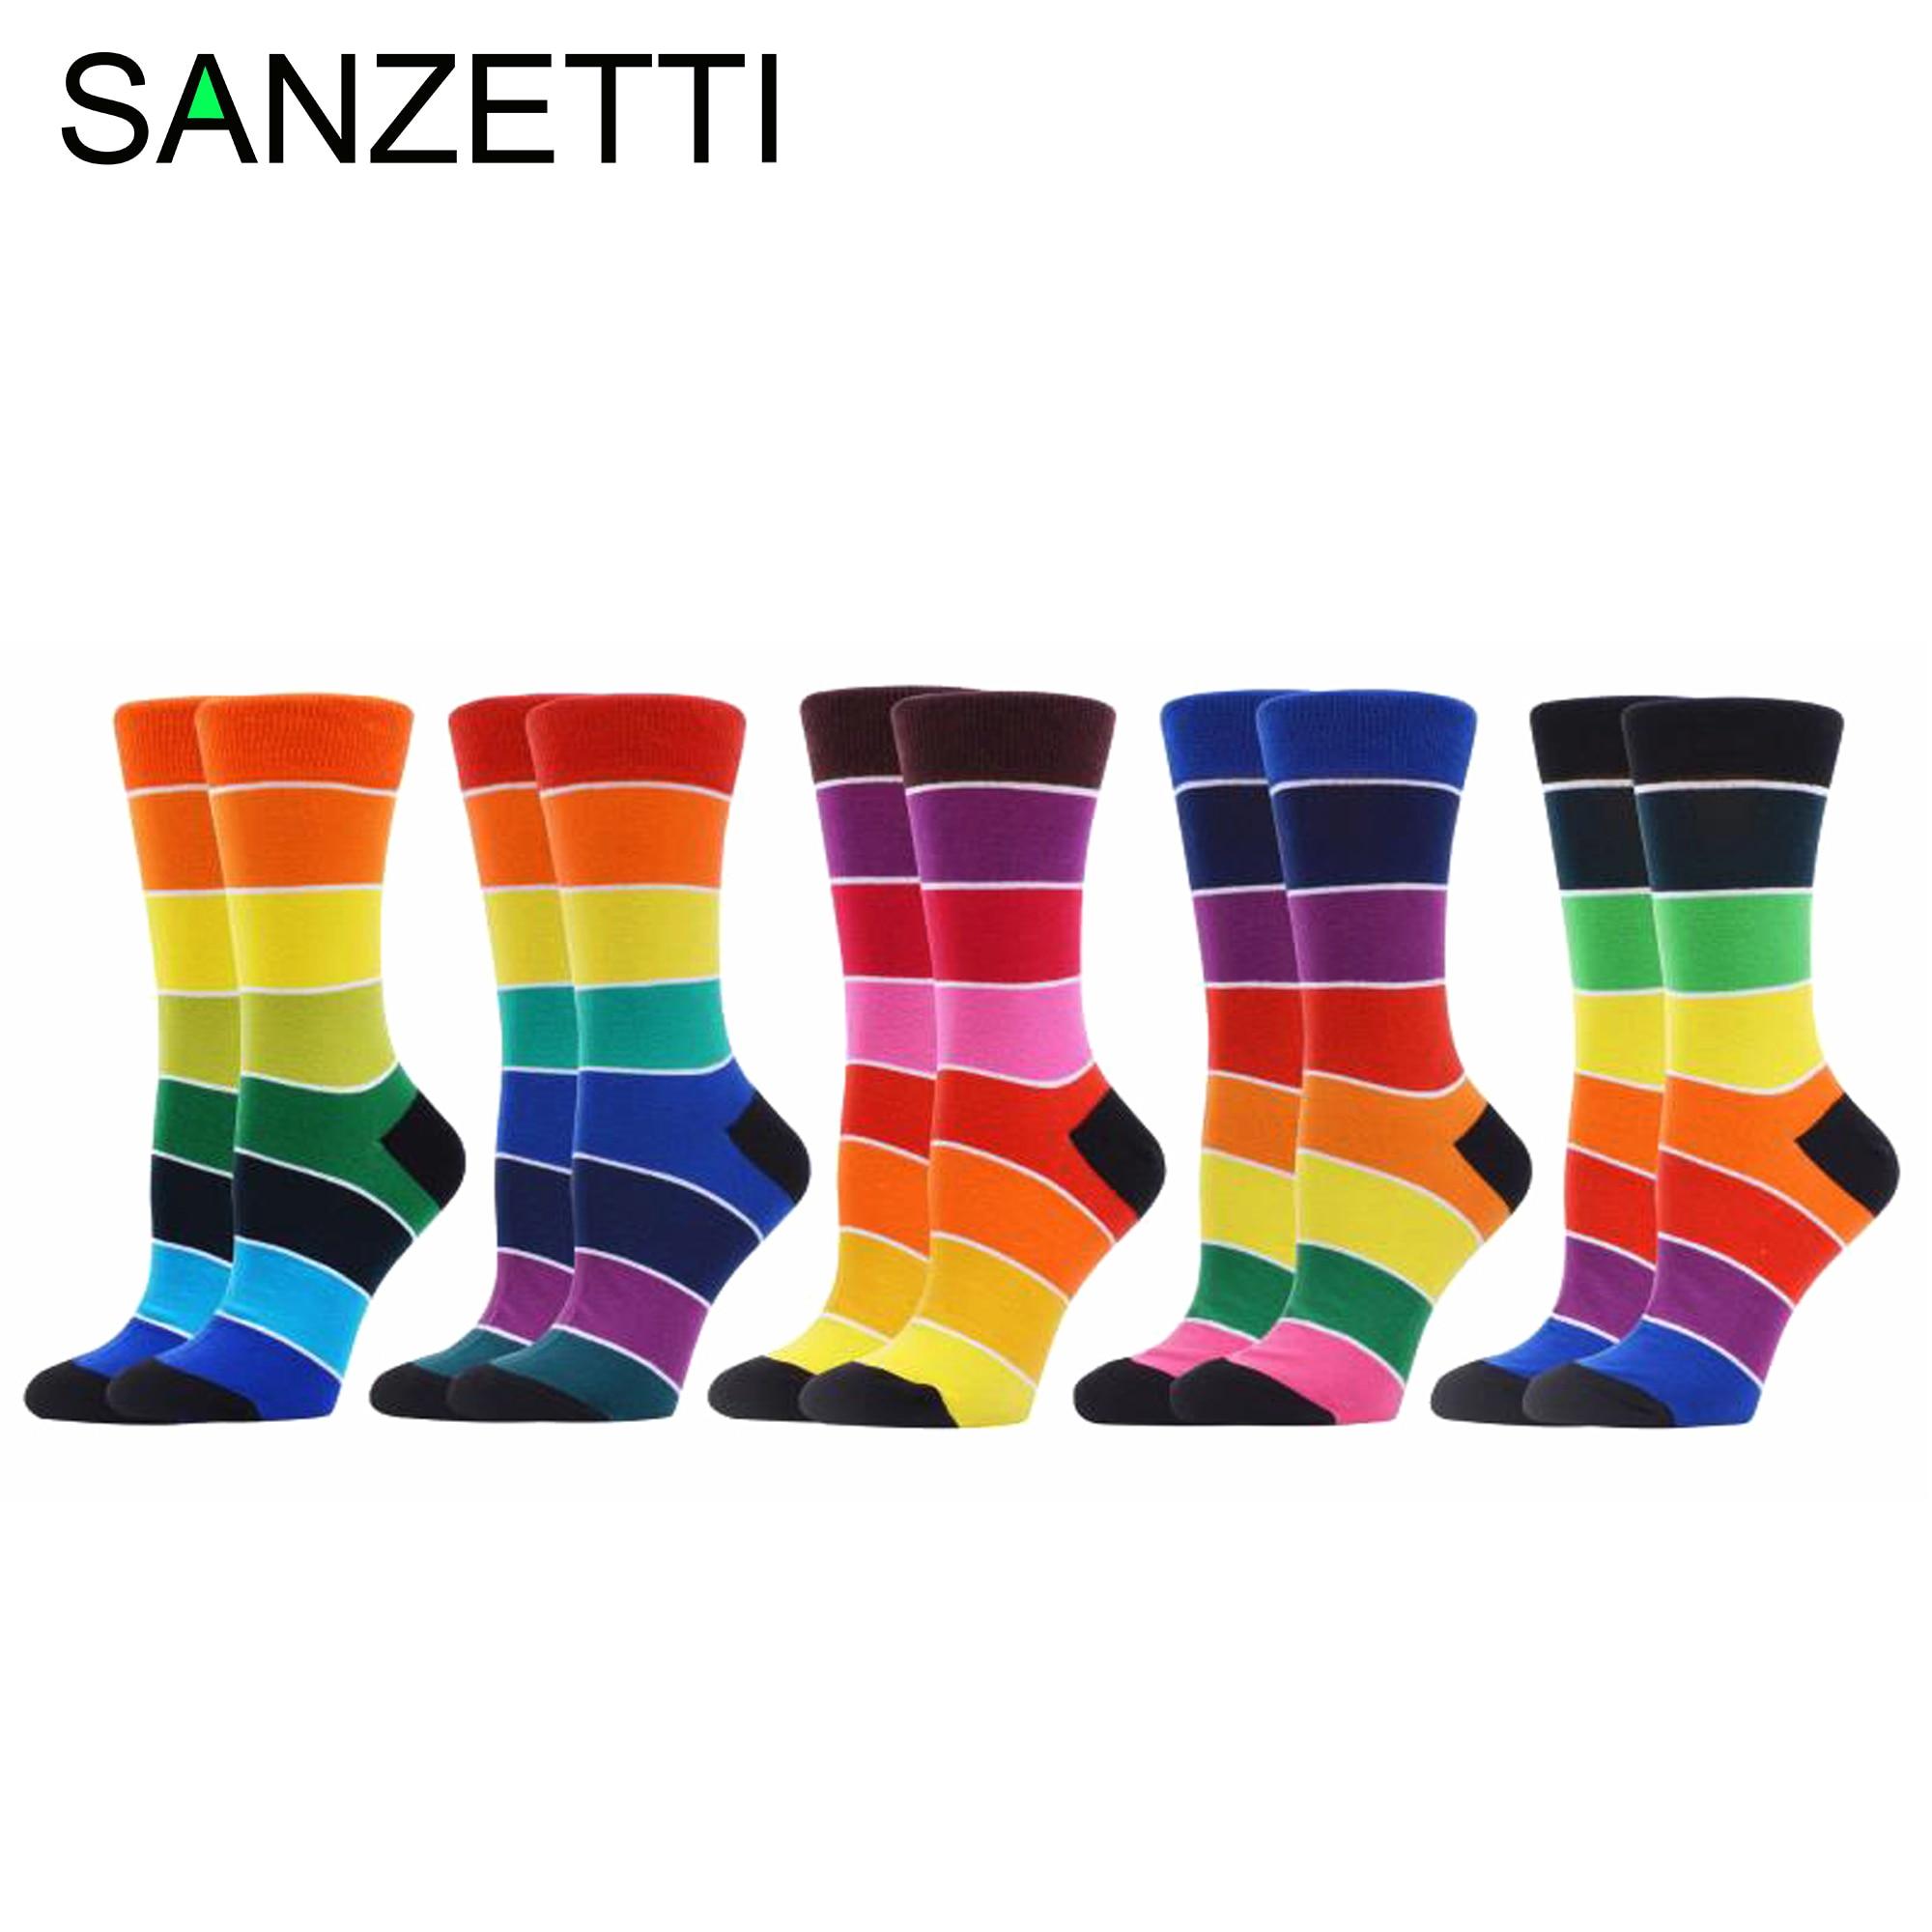 SANZETTI 5 Pairs 2020 Combed Cotton Socks Happy Colorful Iridescent Harajuku Aesthetic Novelty Wedding Gym Party Popular Socks